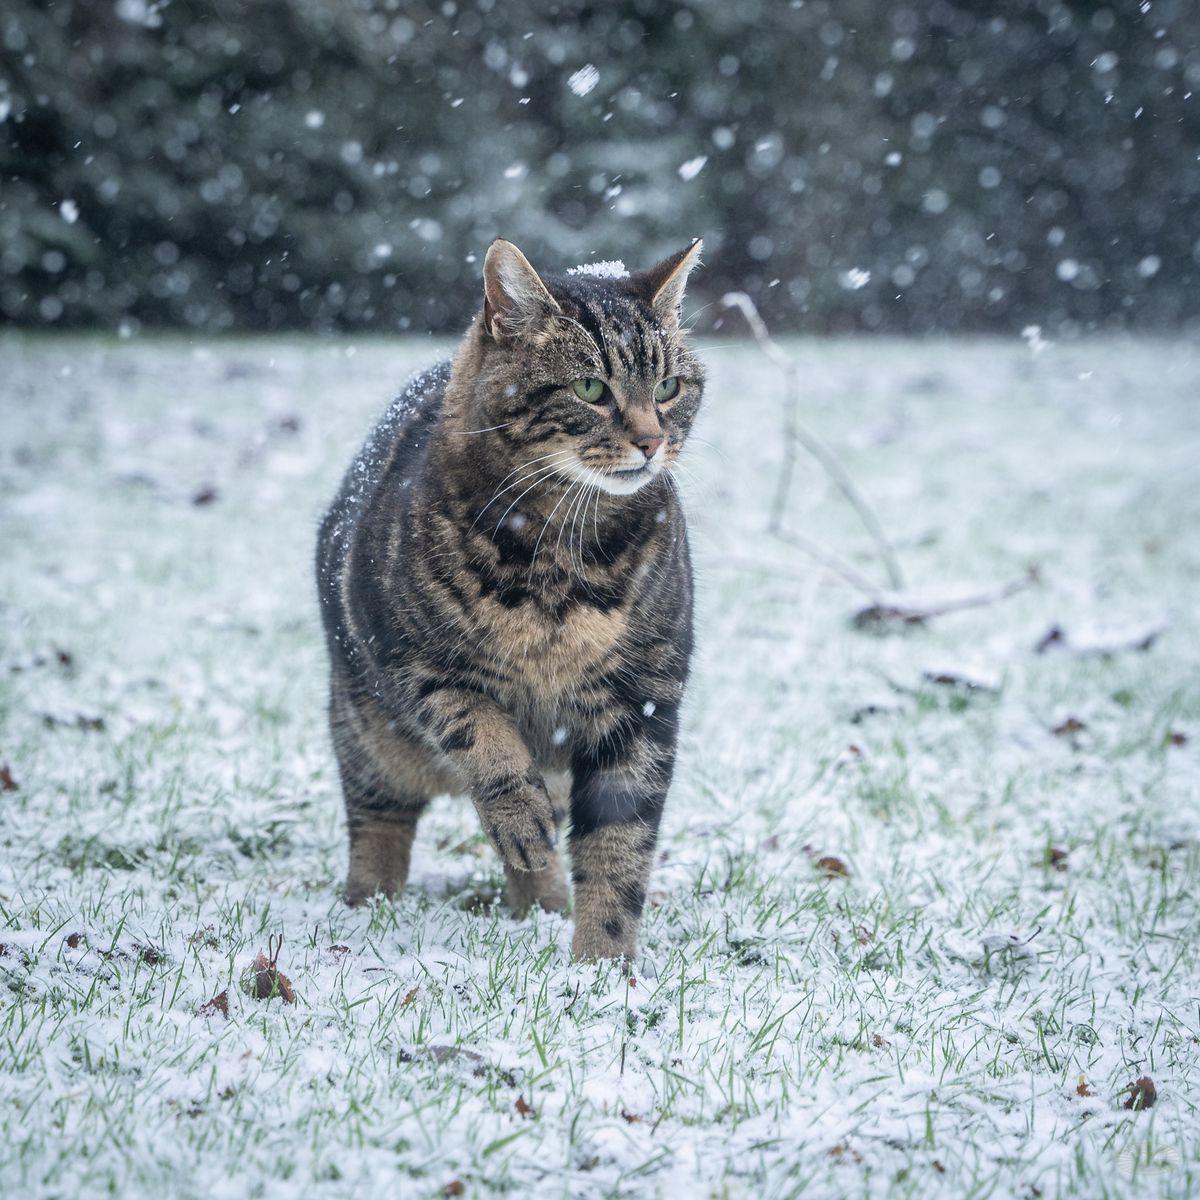 Snow in Staffordshire. Photo: Ian Knight